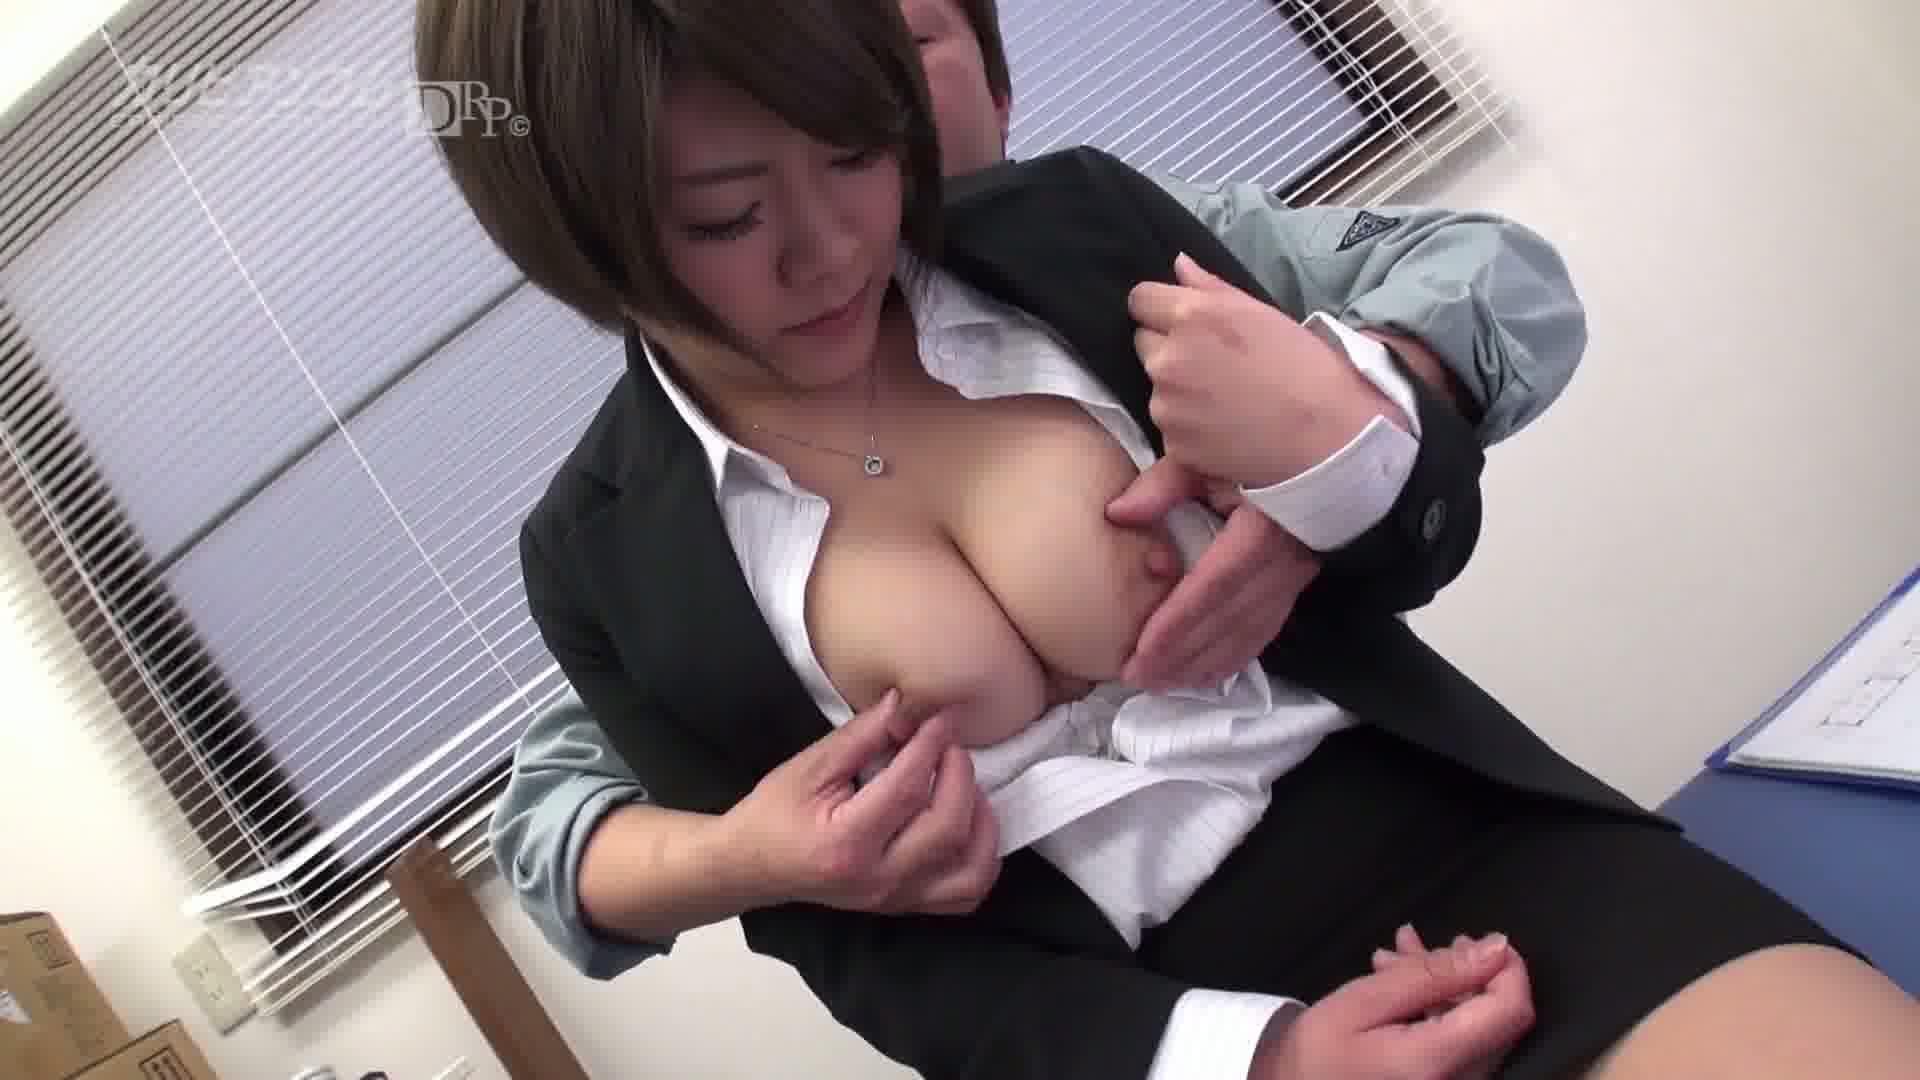 町工場で働く巨乳女社長 - 黒木澪【OL・3P・乱交】